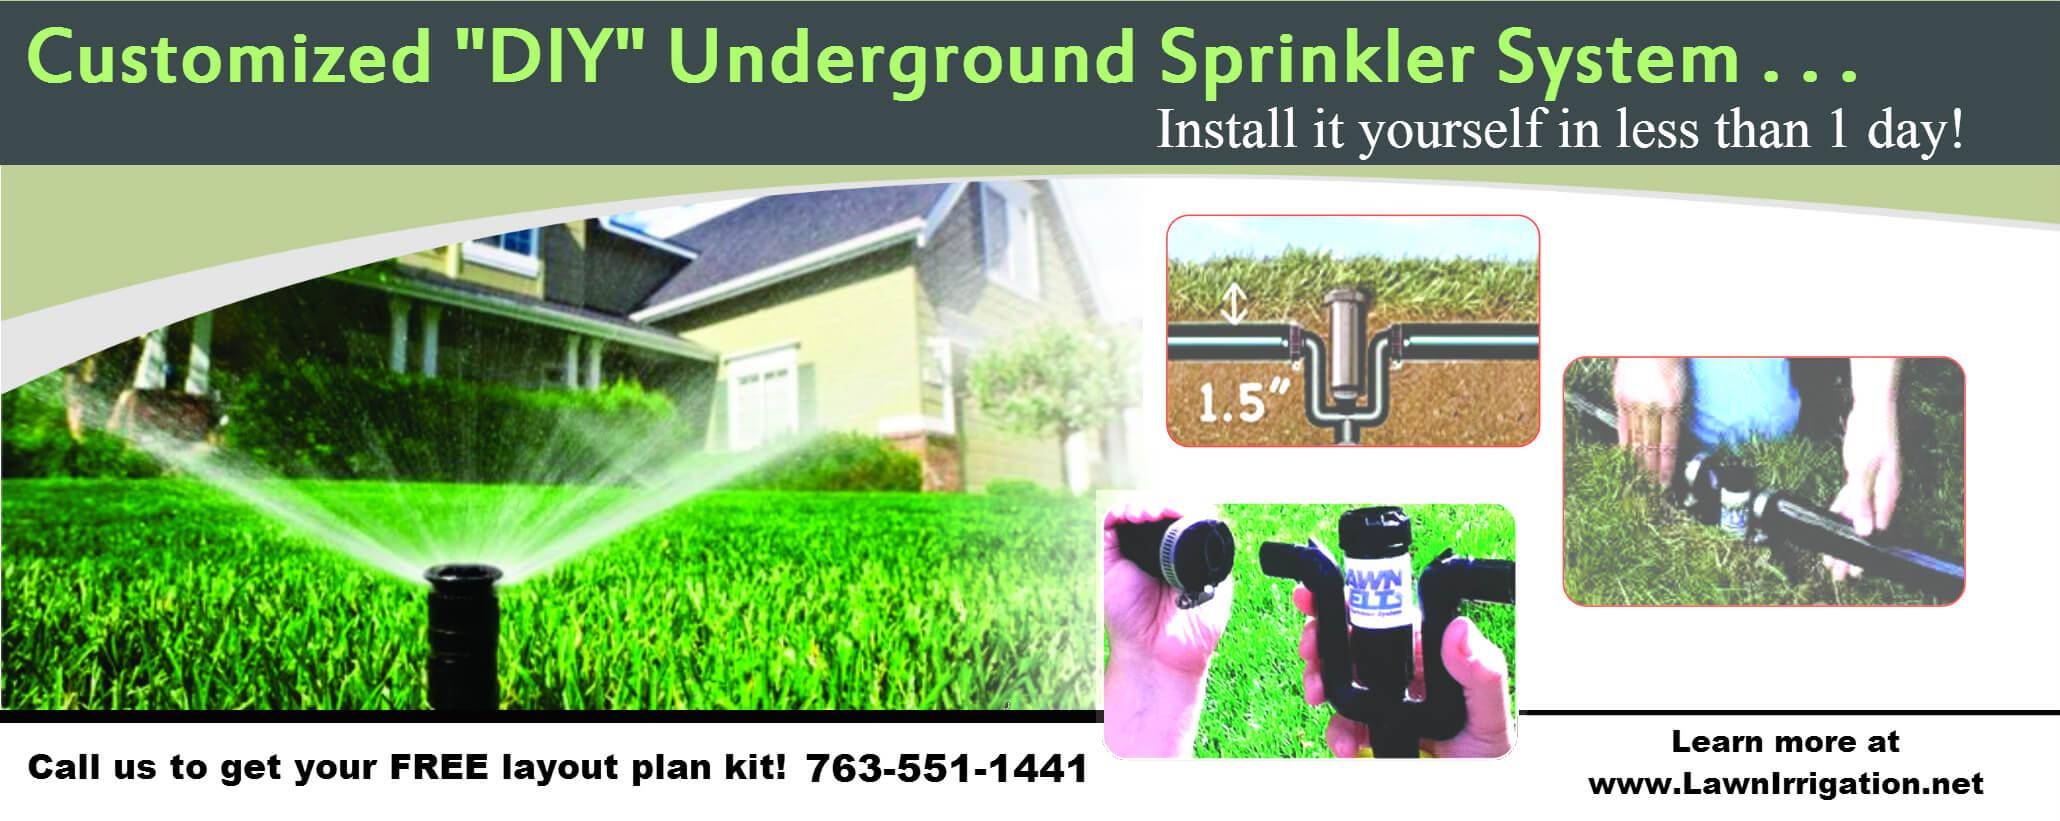 Do it Yourself Underground Sprinkler System